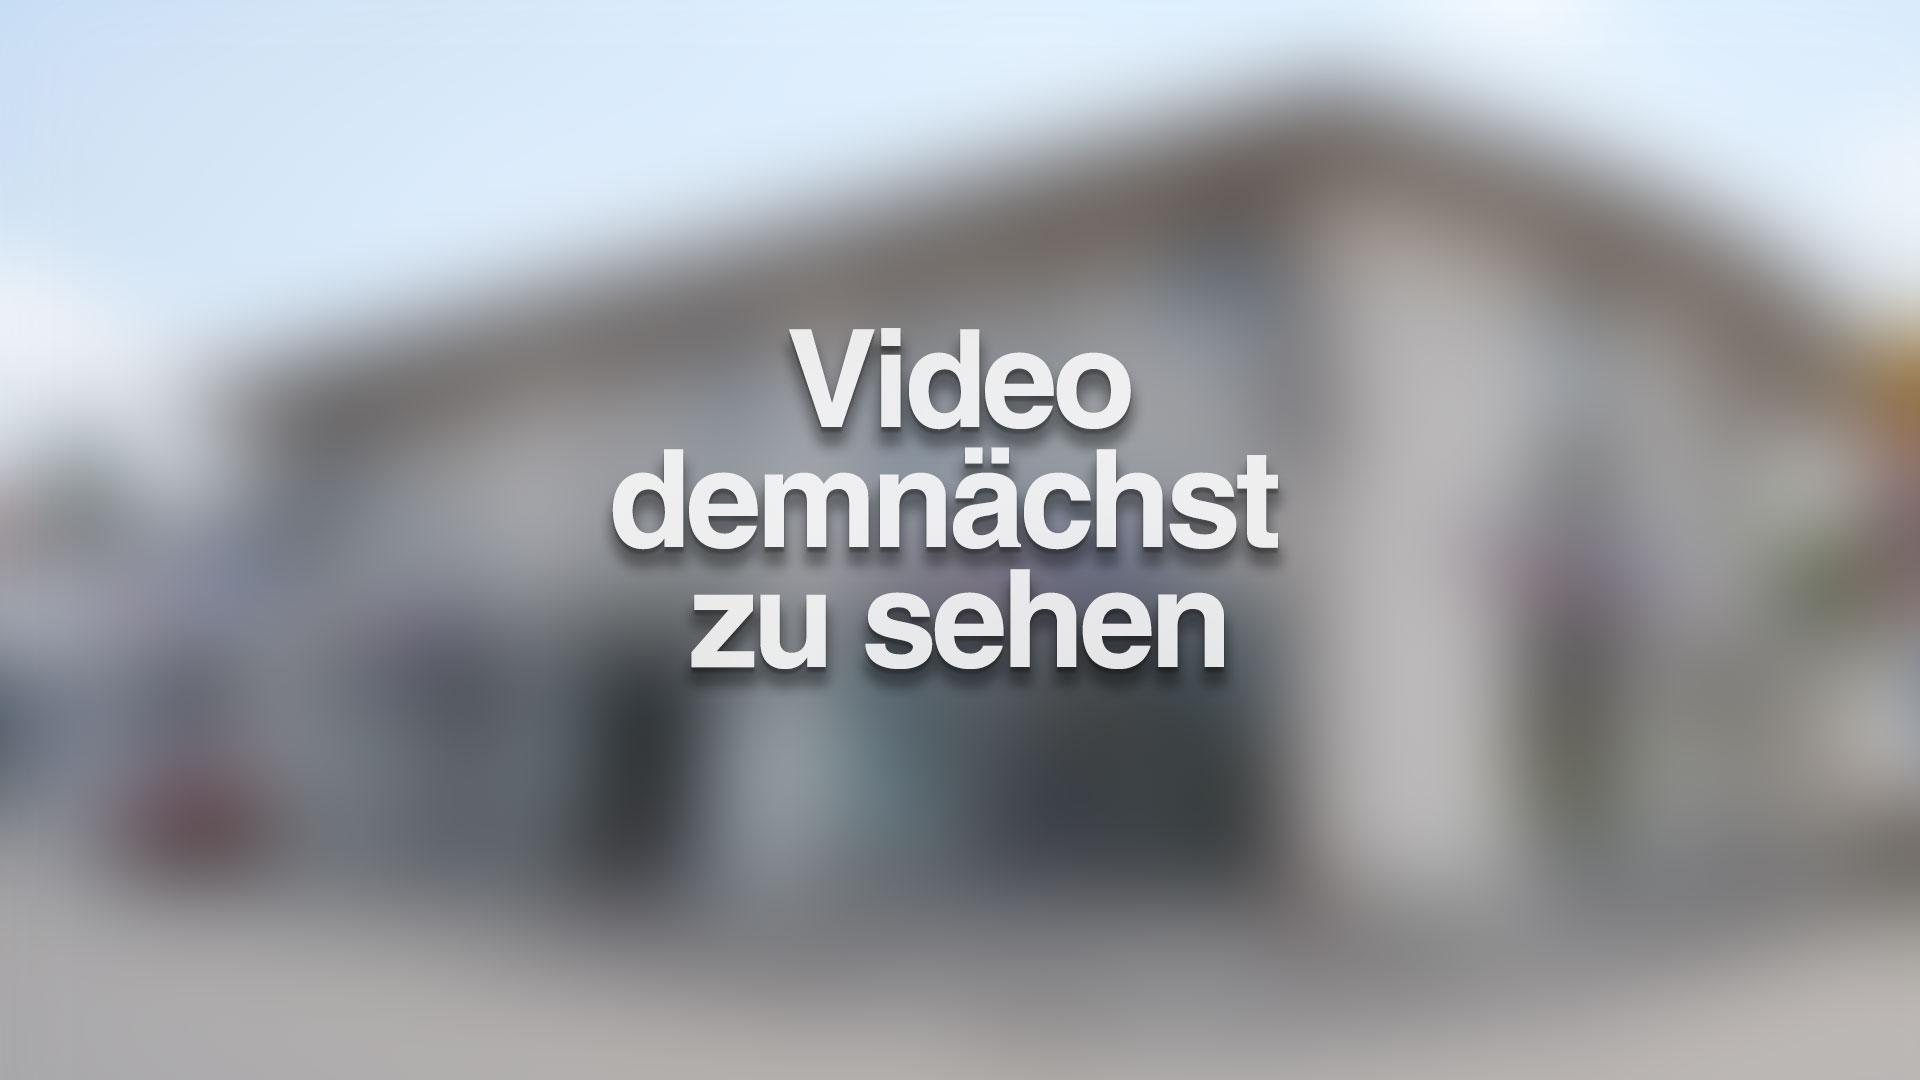 Demnaechst-Viechtach